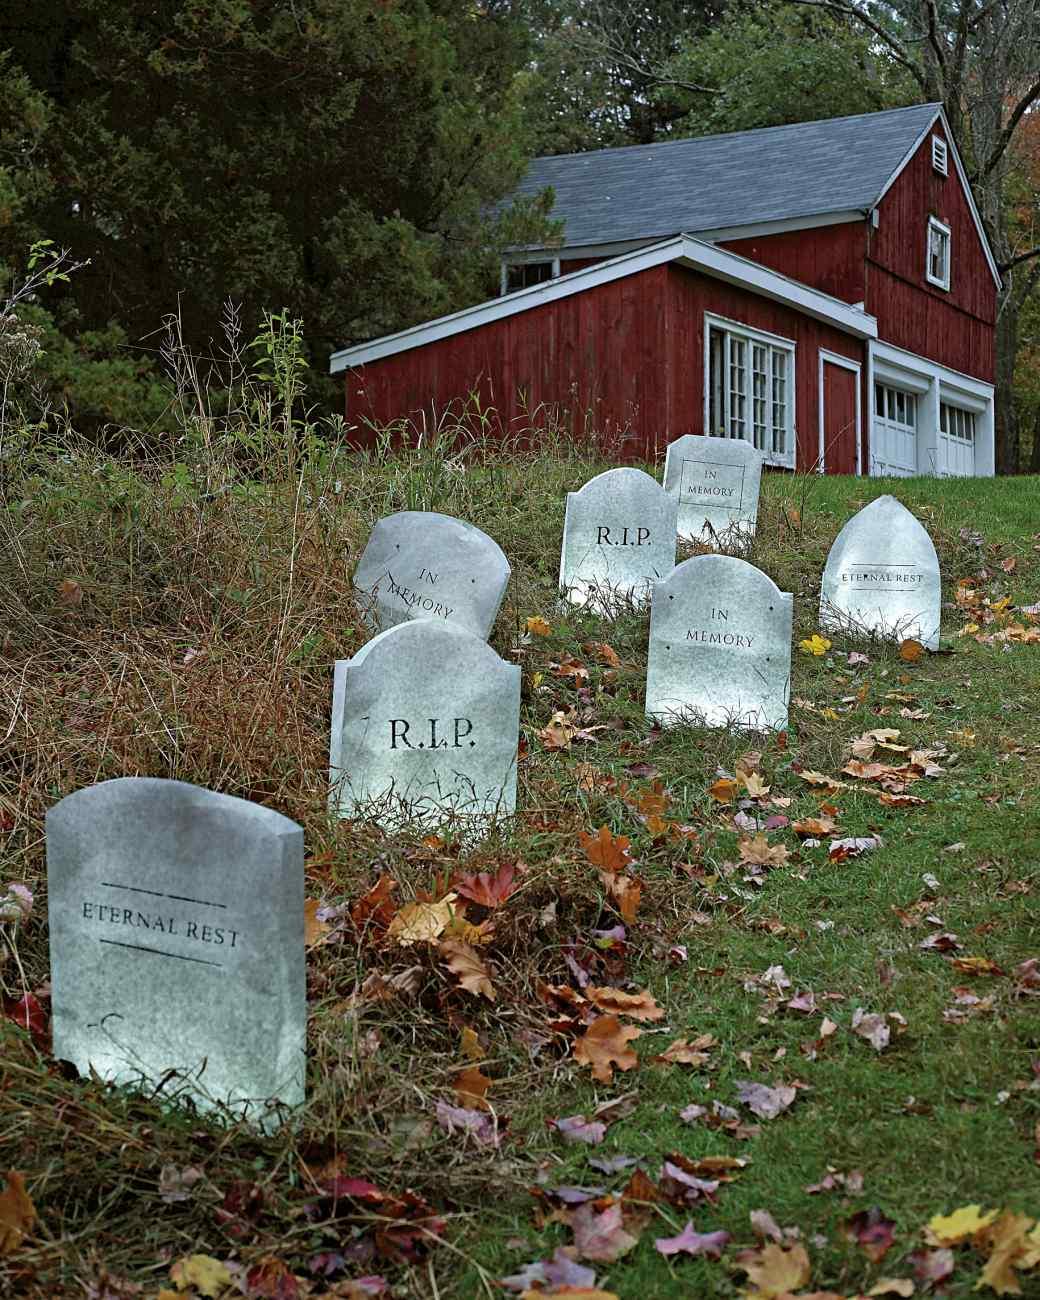 Stunning Rows Halloween Diy Outdoor Outdoor Halloween Decorations Target Outdoor Halloween Decorations On Sale Pieces Tombstones Spooky decor Outdoor Halloween Decorations